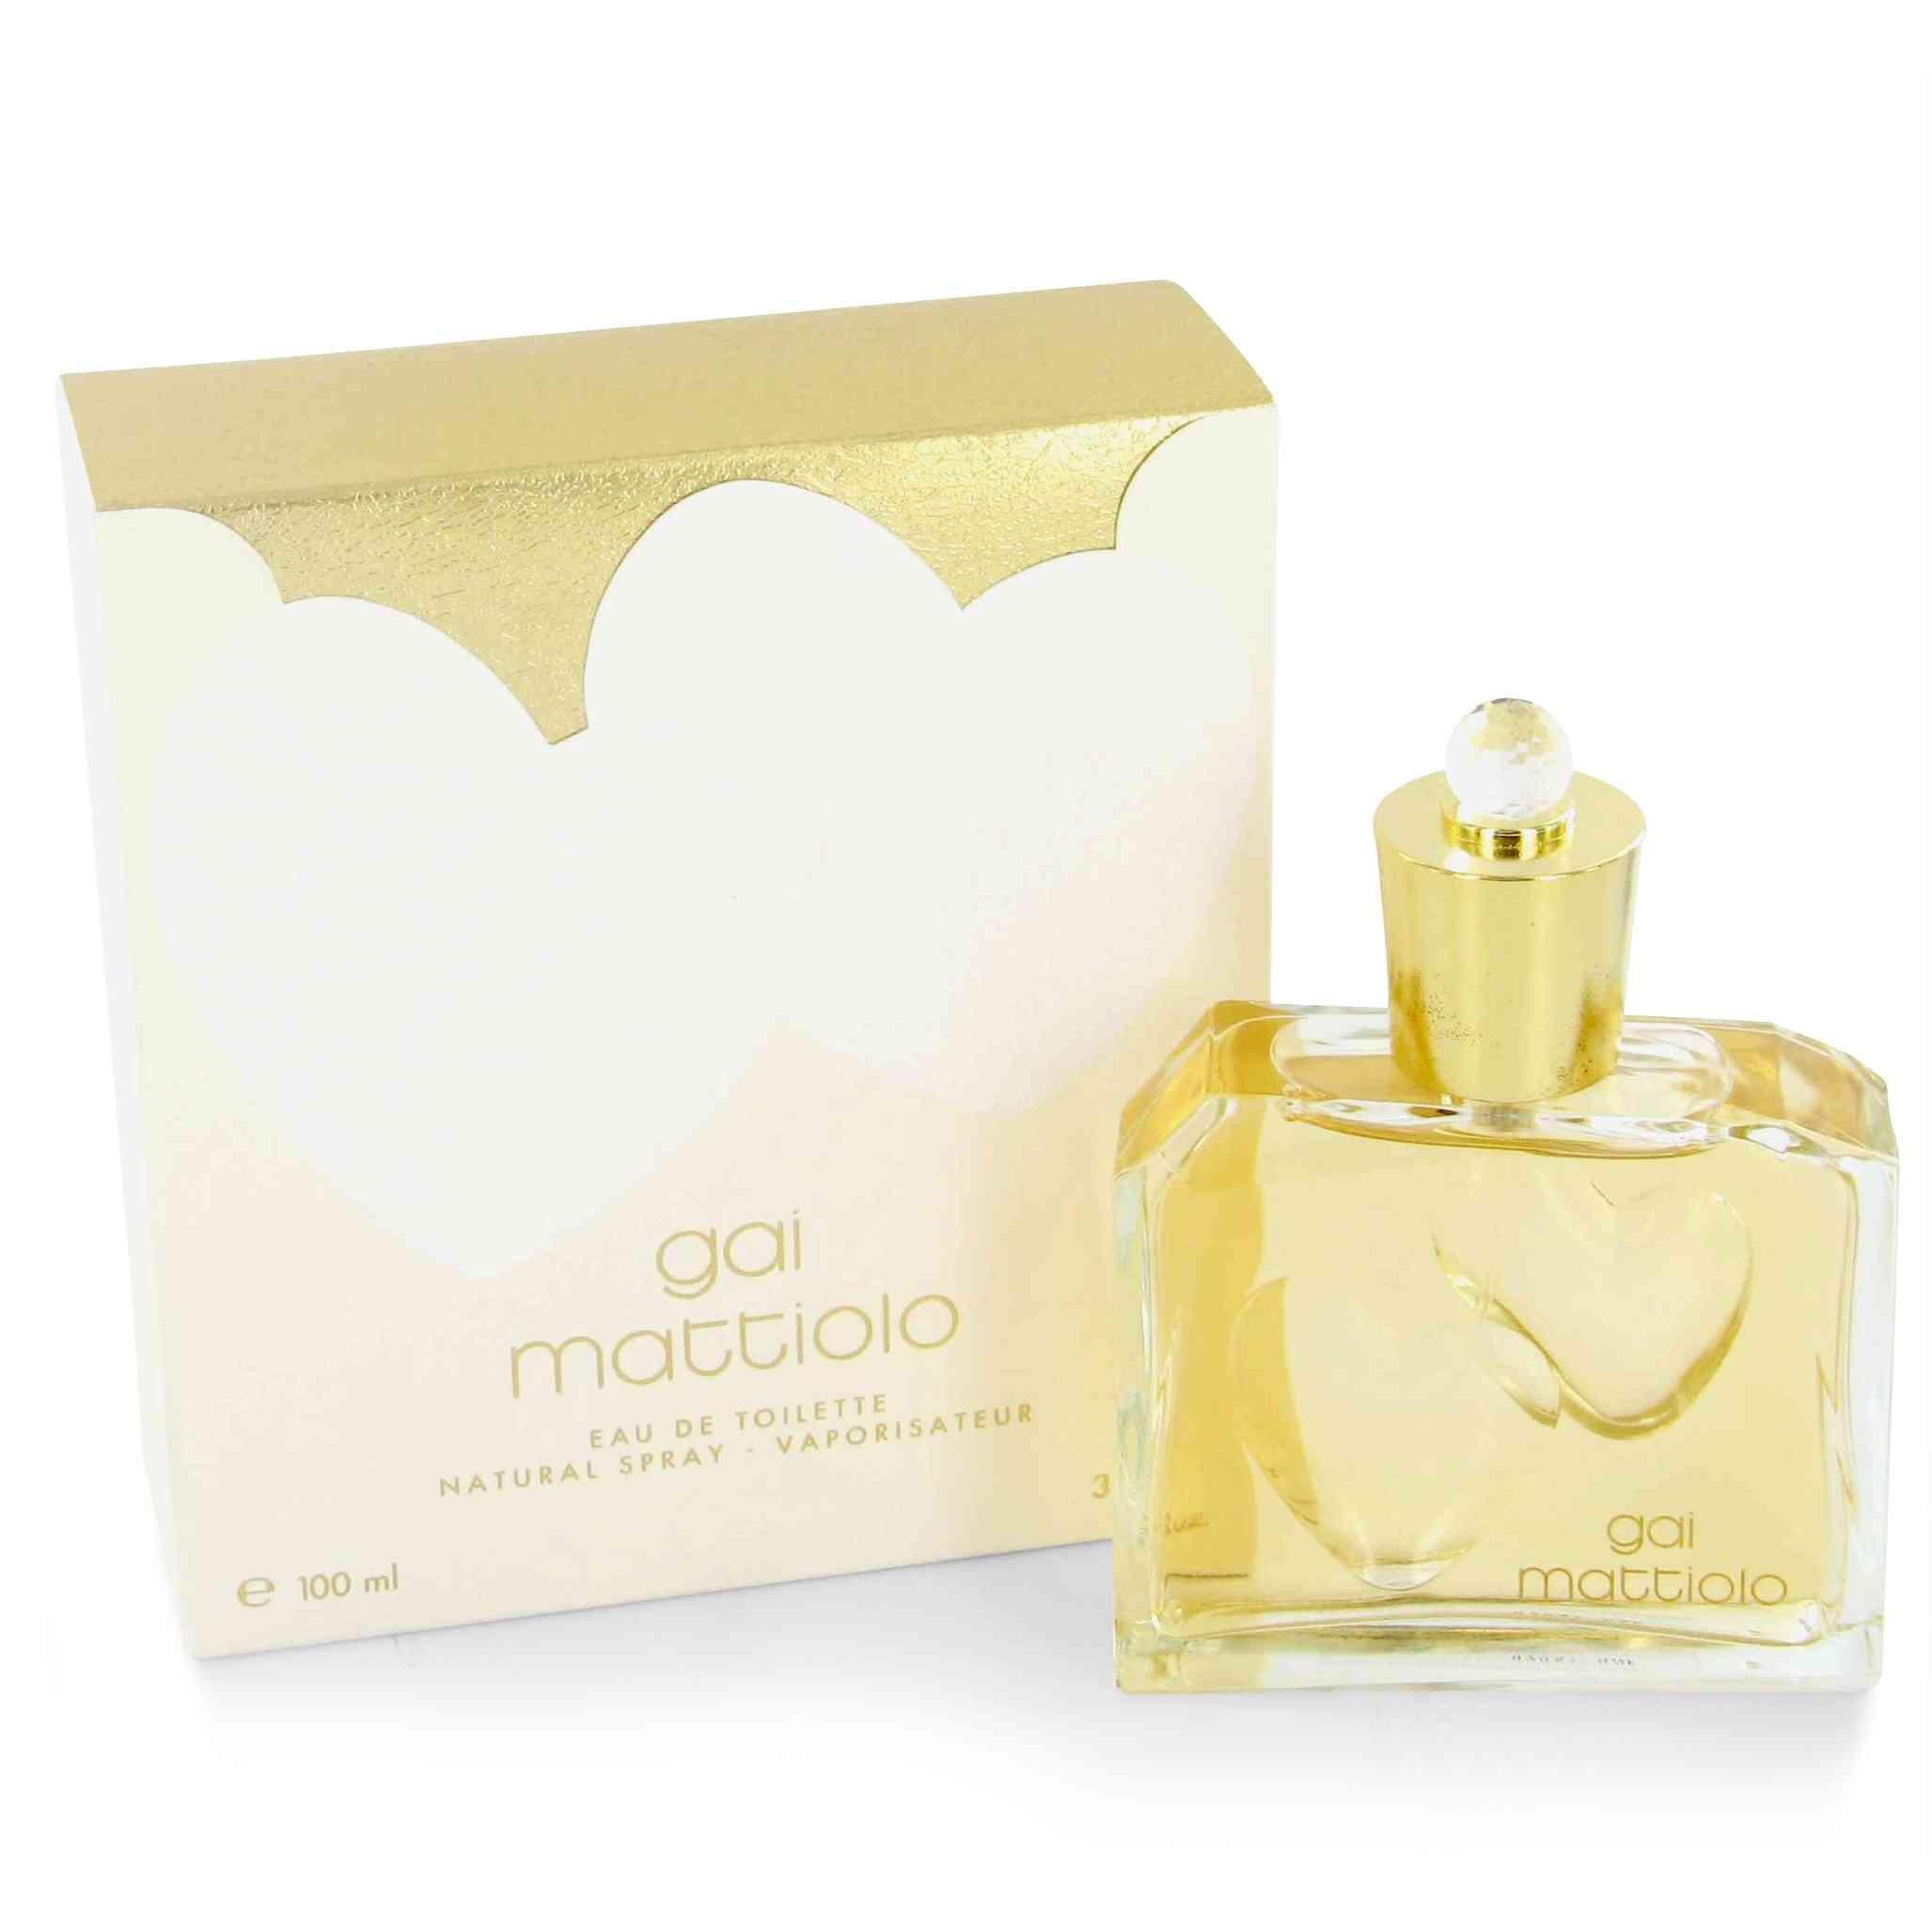 Gai Mattiolo аромат для женщин